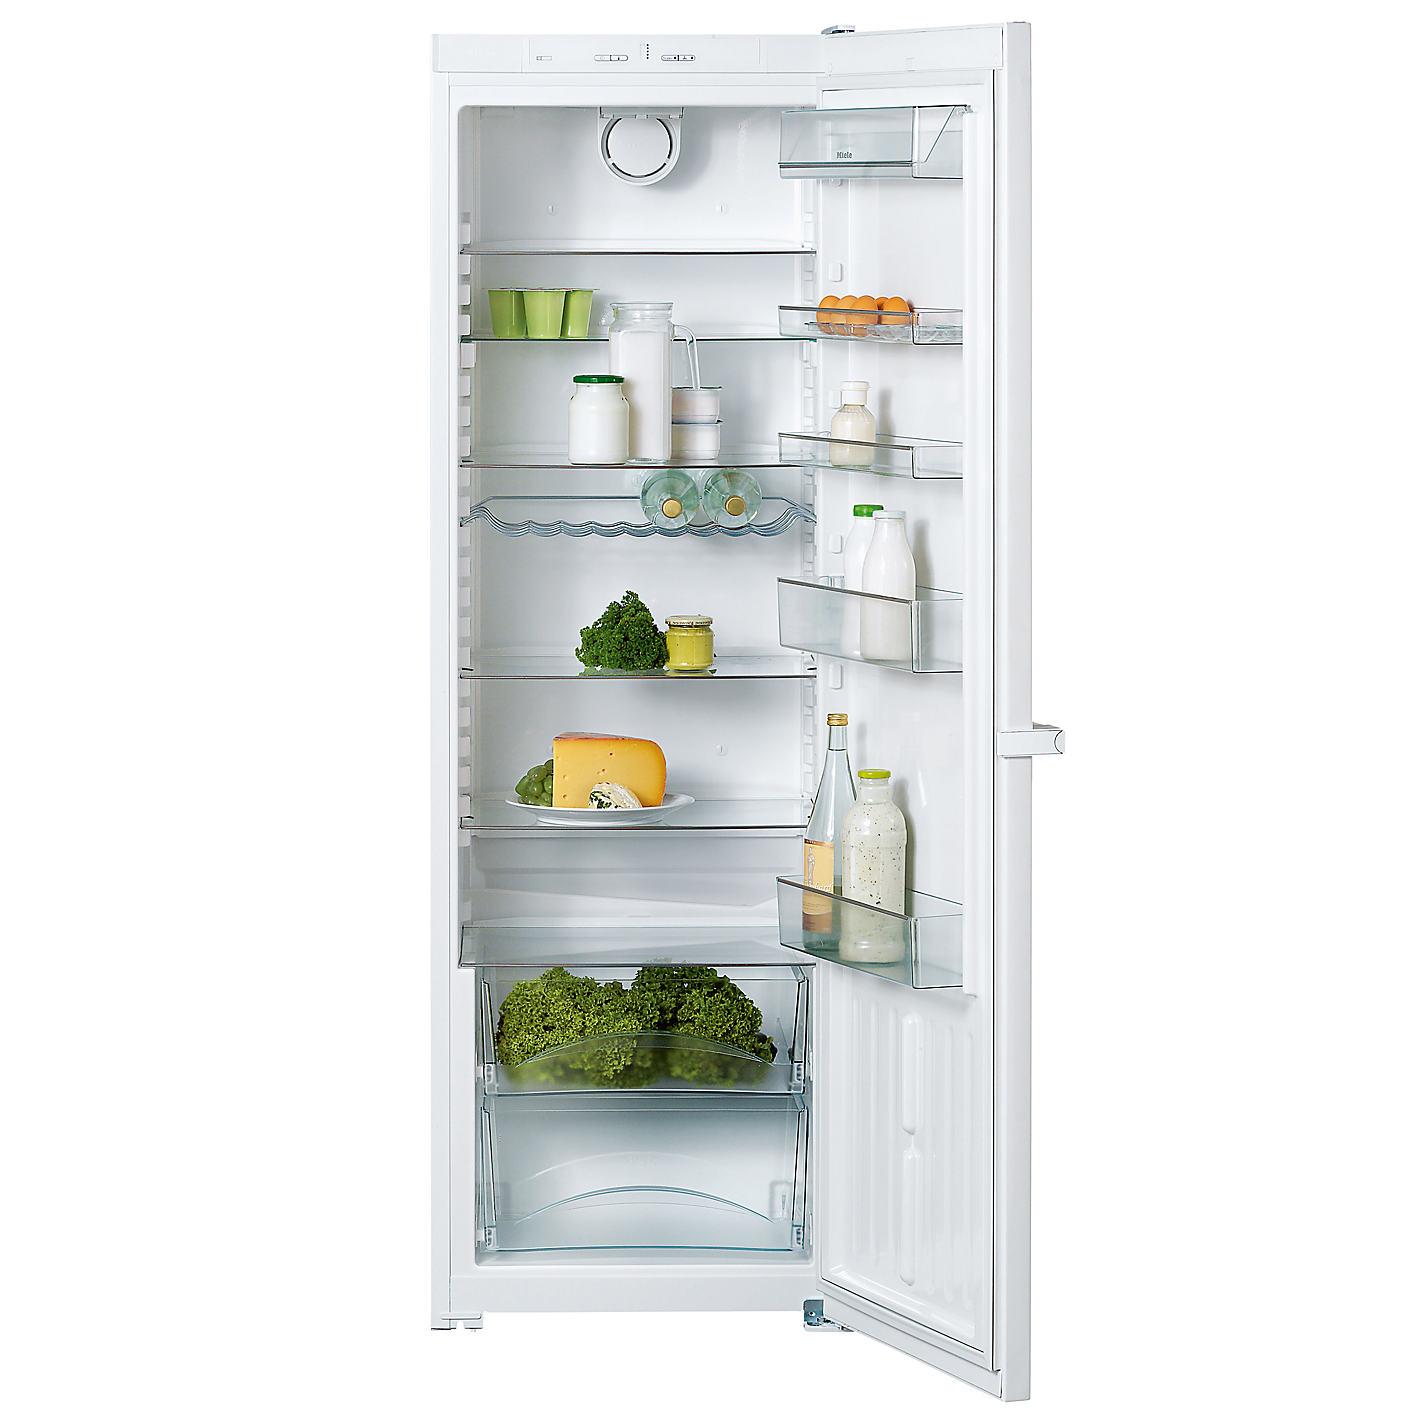 Reillys Home Appliances Miele All Fridge